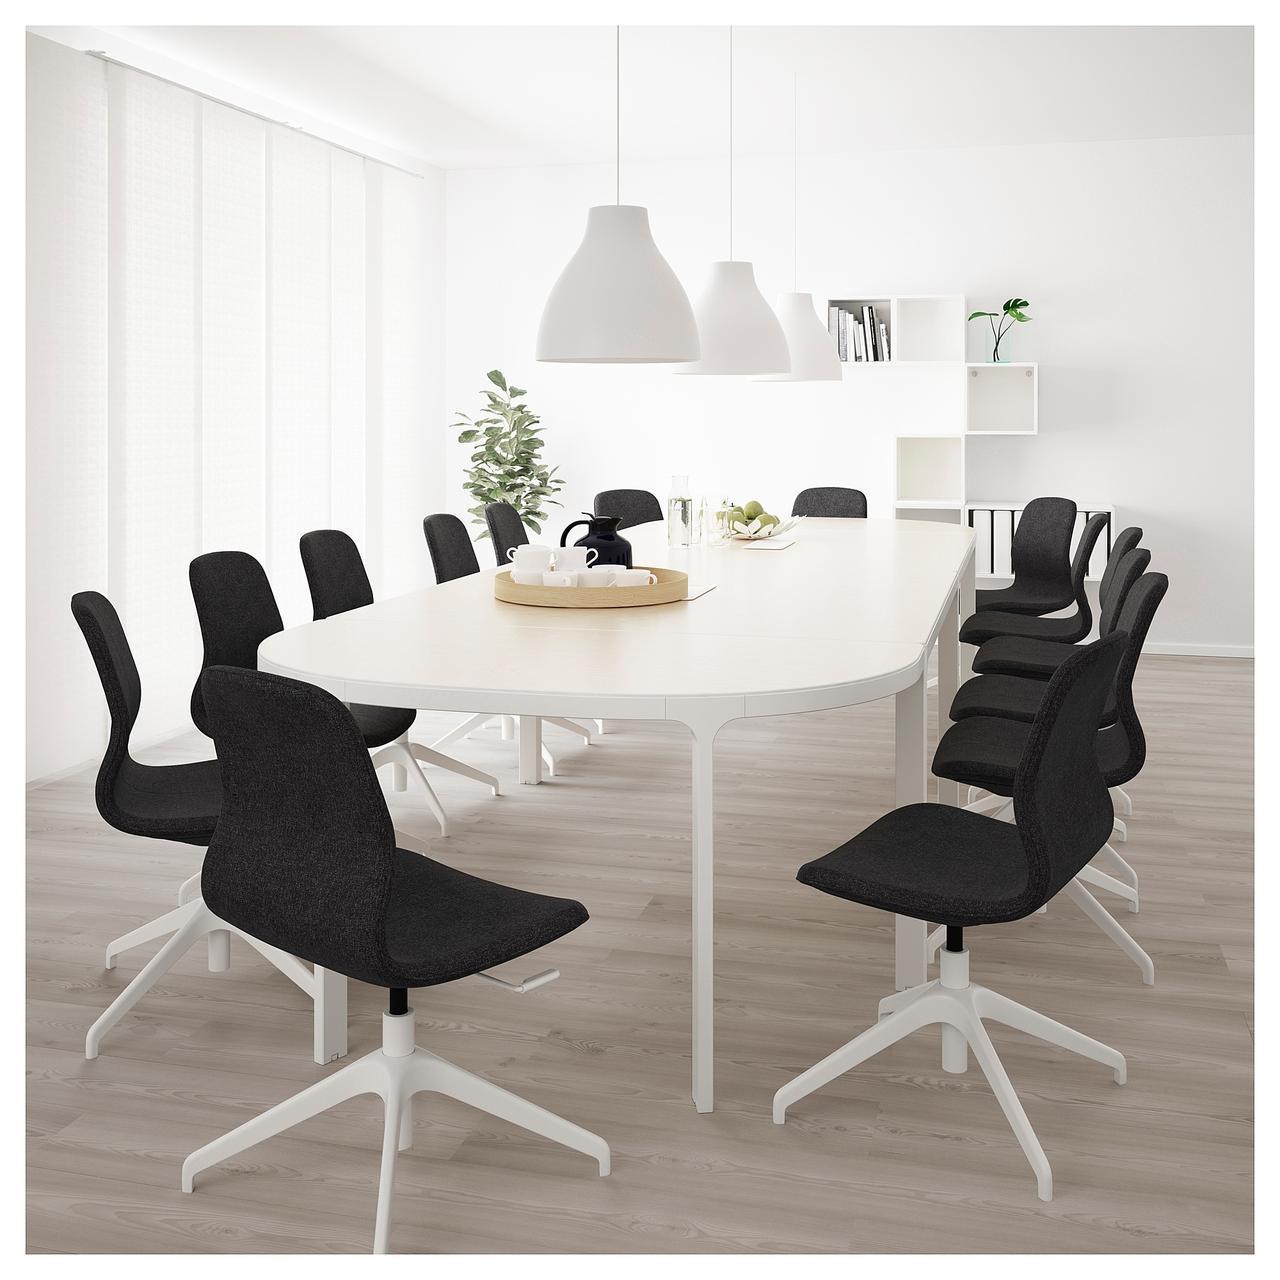 Конференц-стол BEKANT 420х140 см